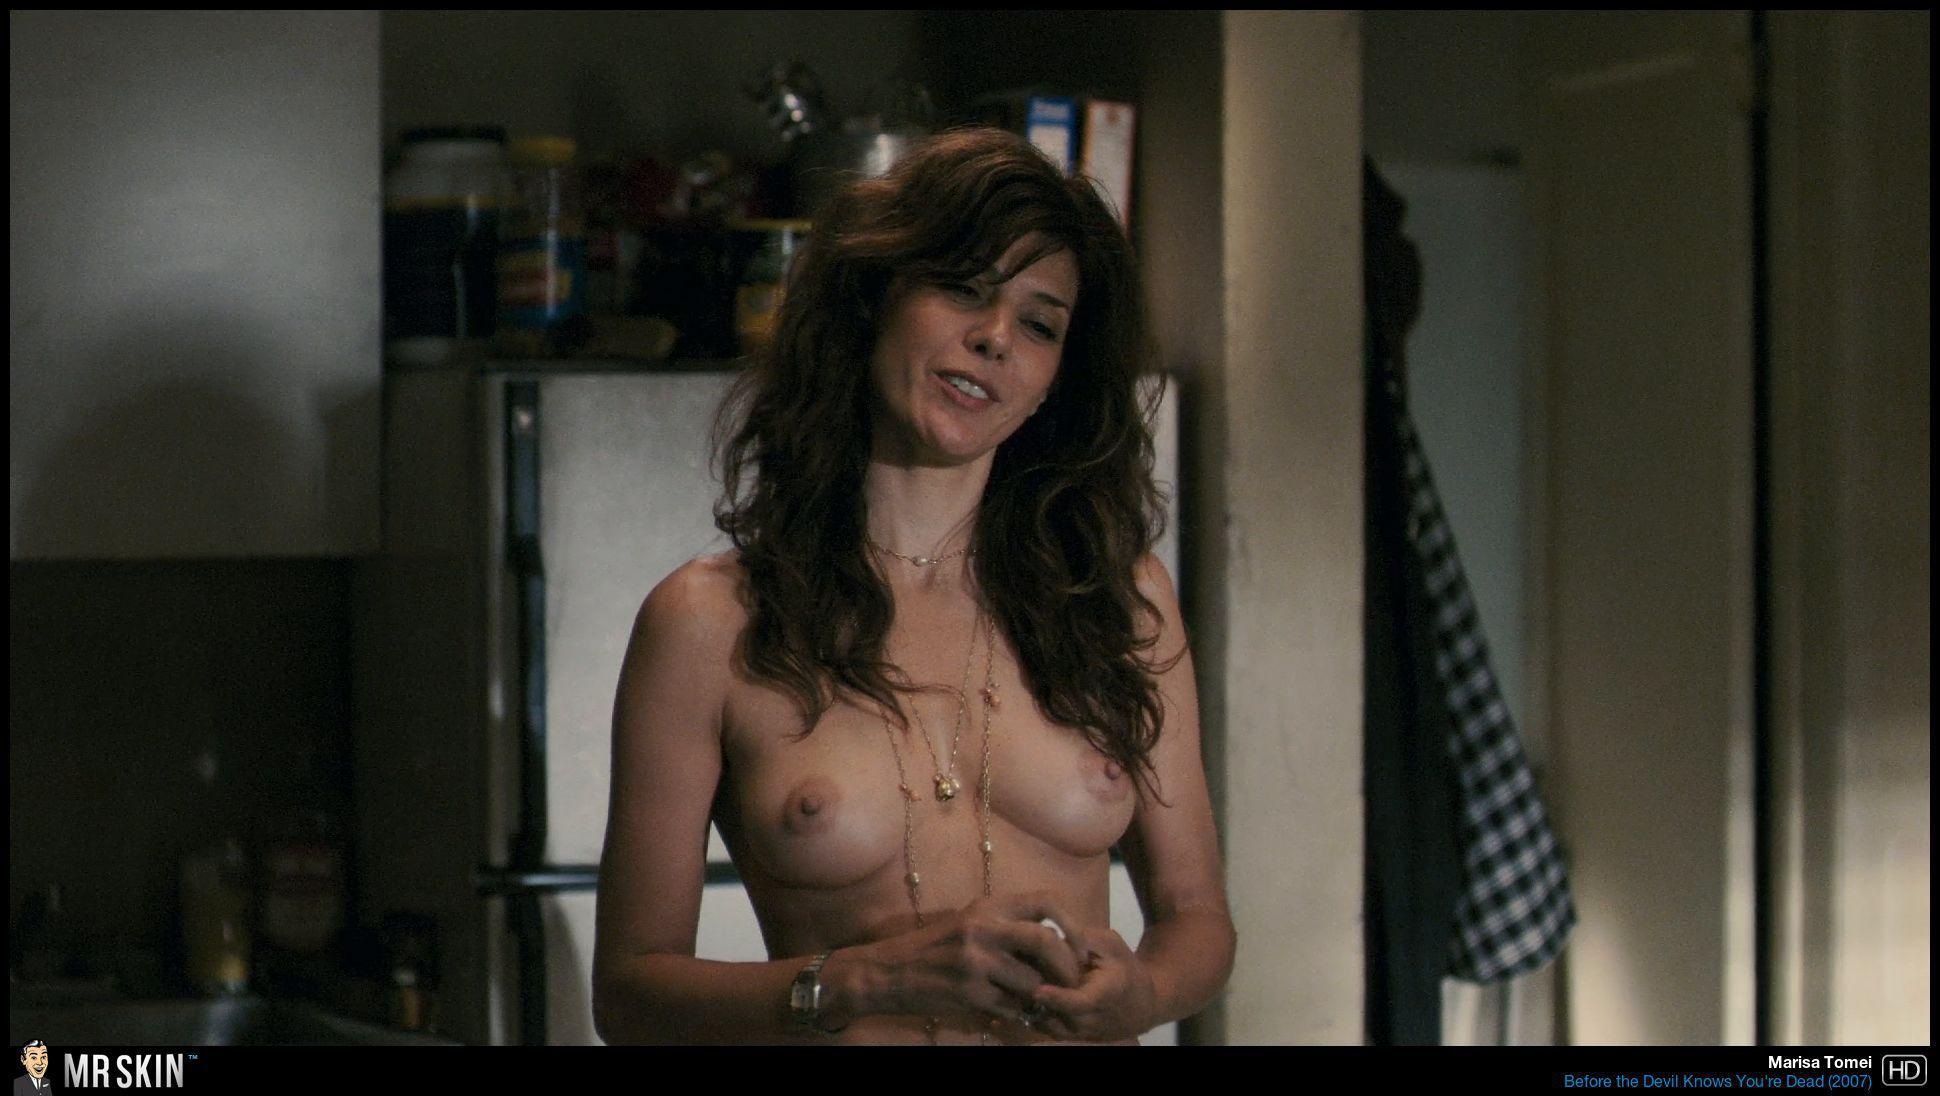 Nude allison janney Allison Janney